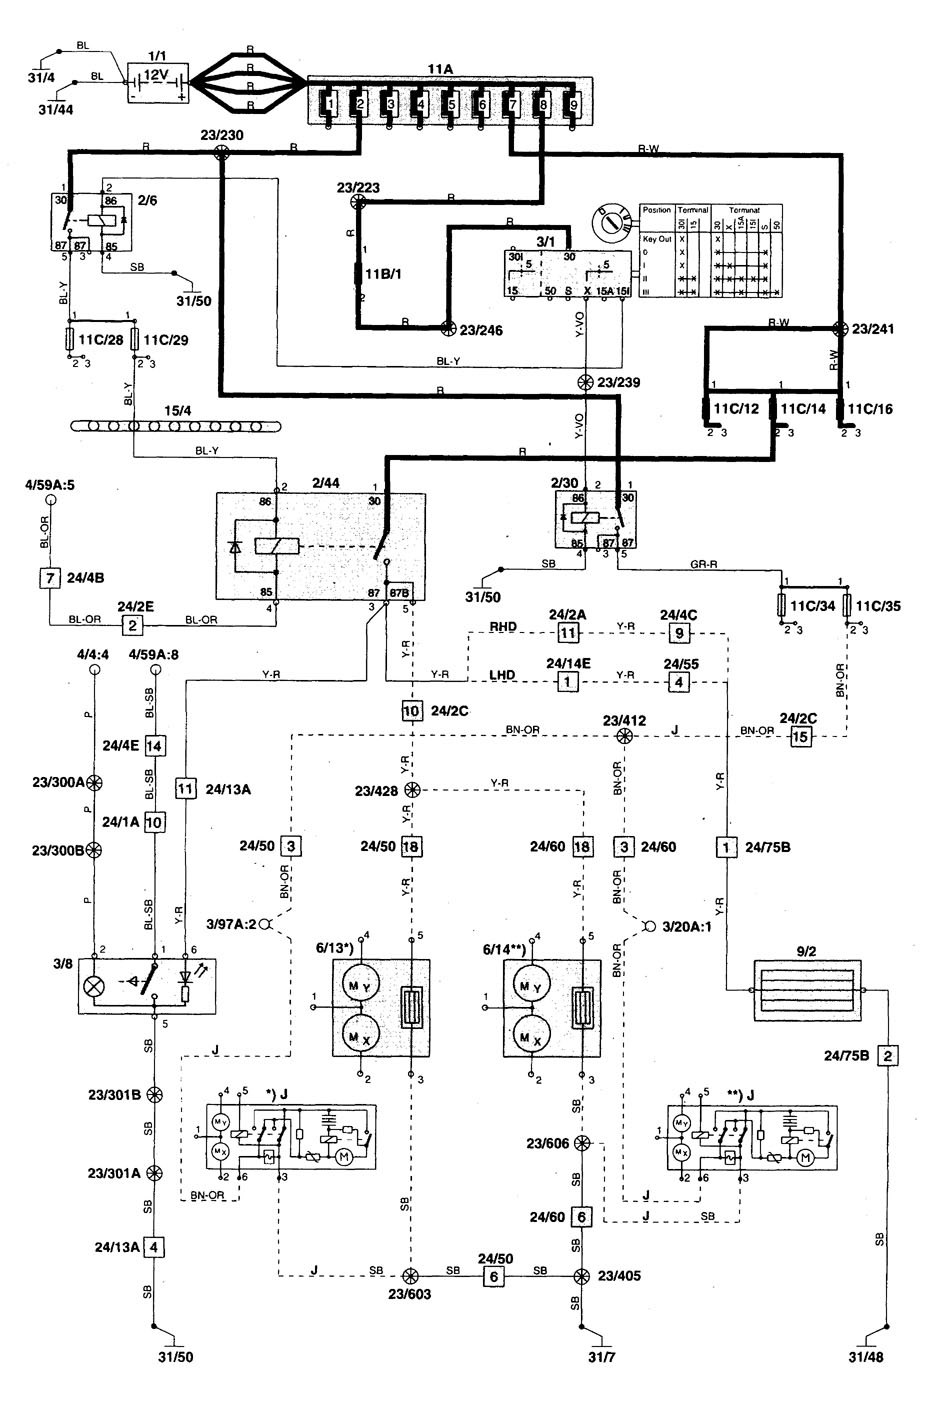 Volvo C70 1998 2004 Wiring Diagrams Heated Mirror Carknowledge Diagram